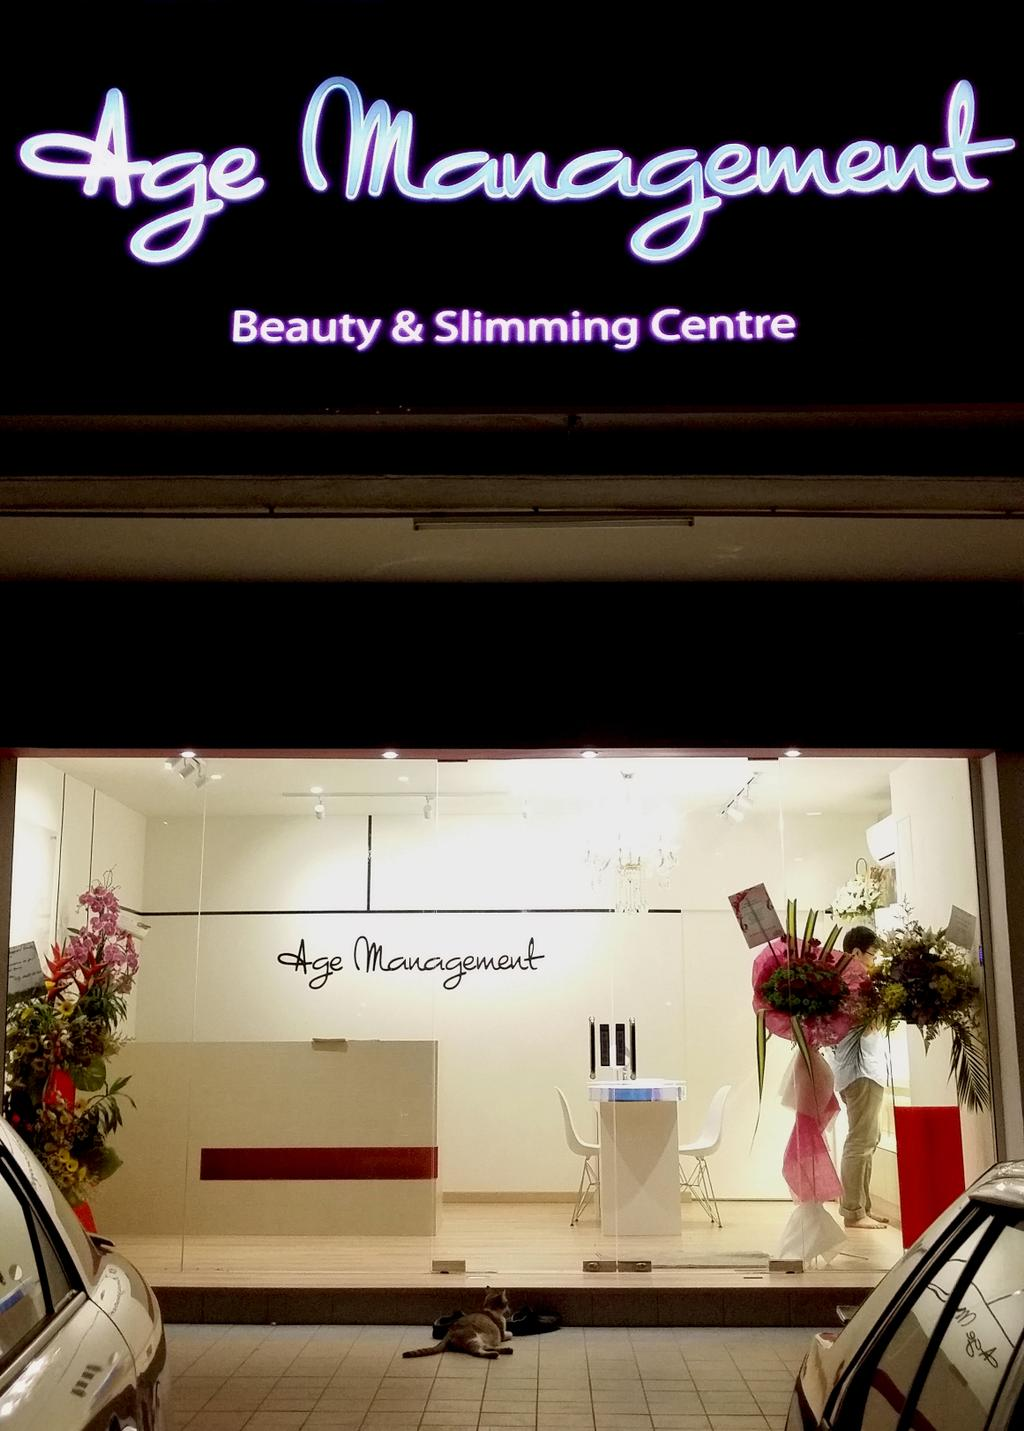 Age Management Beauty Salon, Bandar Menjalara, Commercial, Interior Designer, TOD Interior Design, Modern, Minimalistic, Flora, Jar, Plant, Potted Plant, Pottery, Vase, Blossom, Flower, Flower Arrangement, Ornament